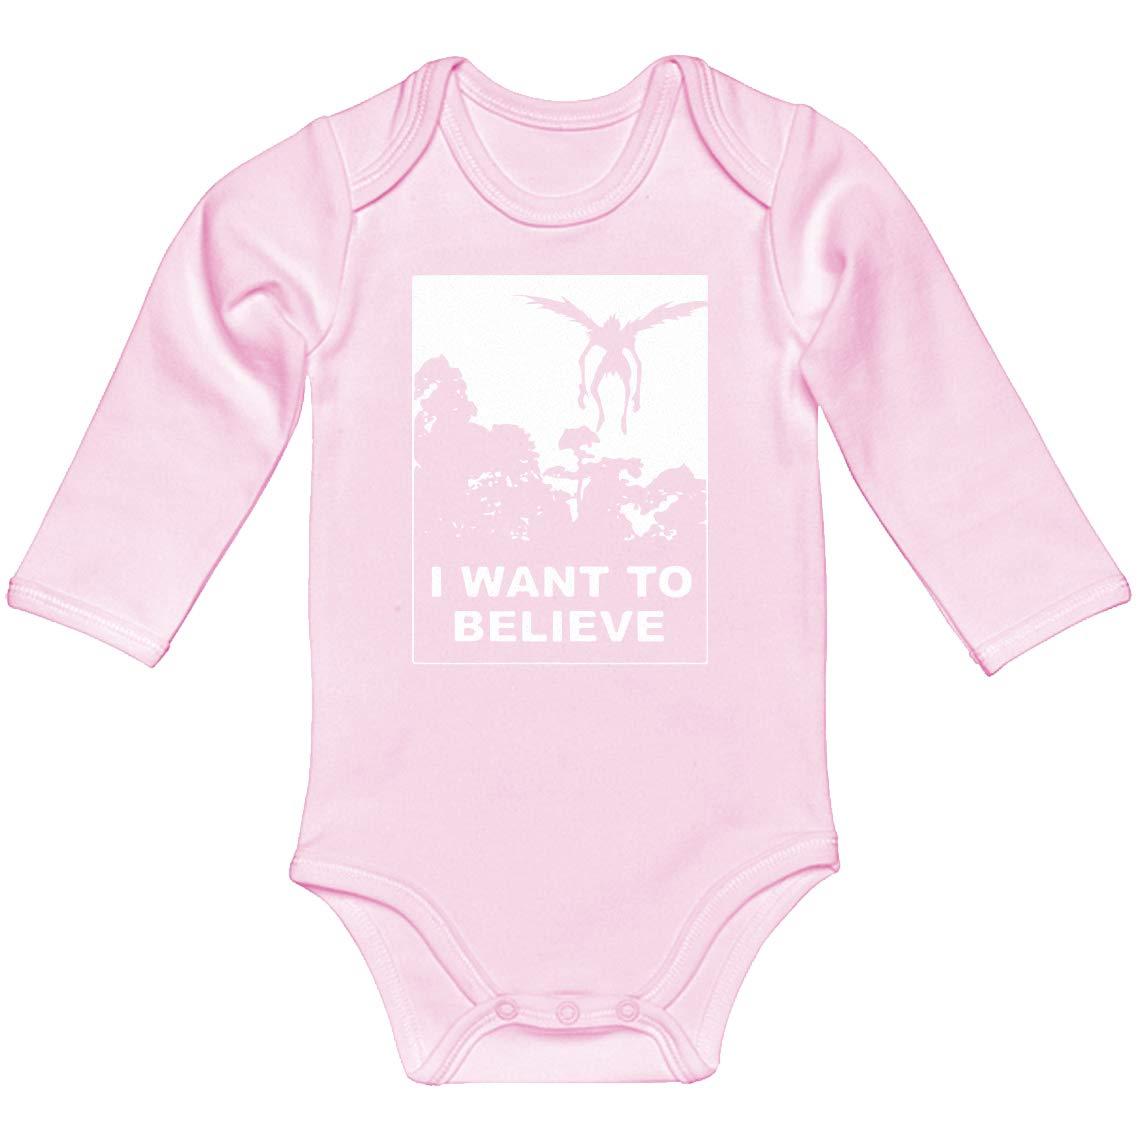 Indica Plateau Baby Onesie I Want to Believe Shinigami 100/% Cotton Long Sleeve Infant Bodysuit